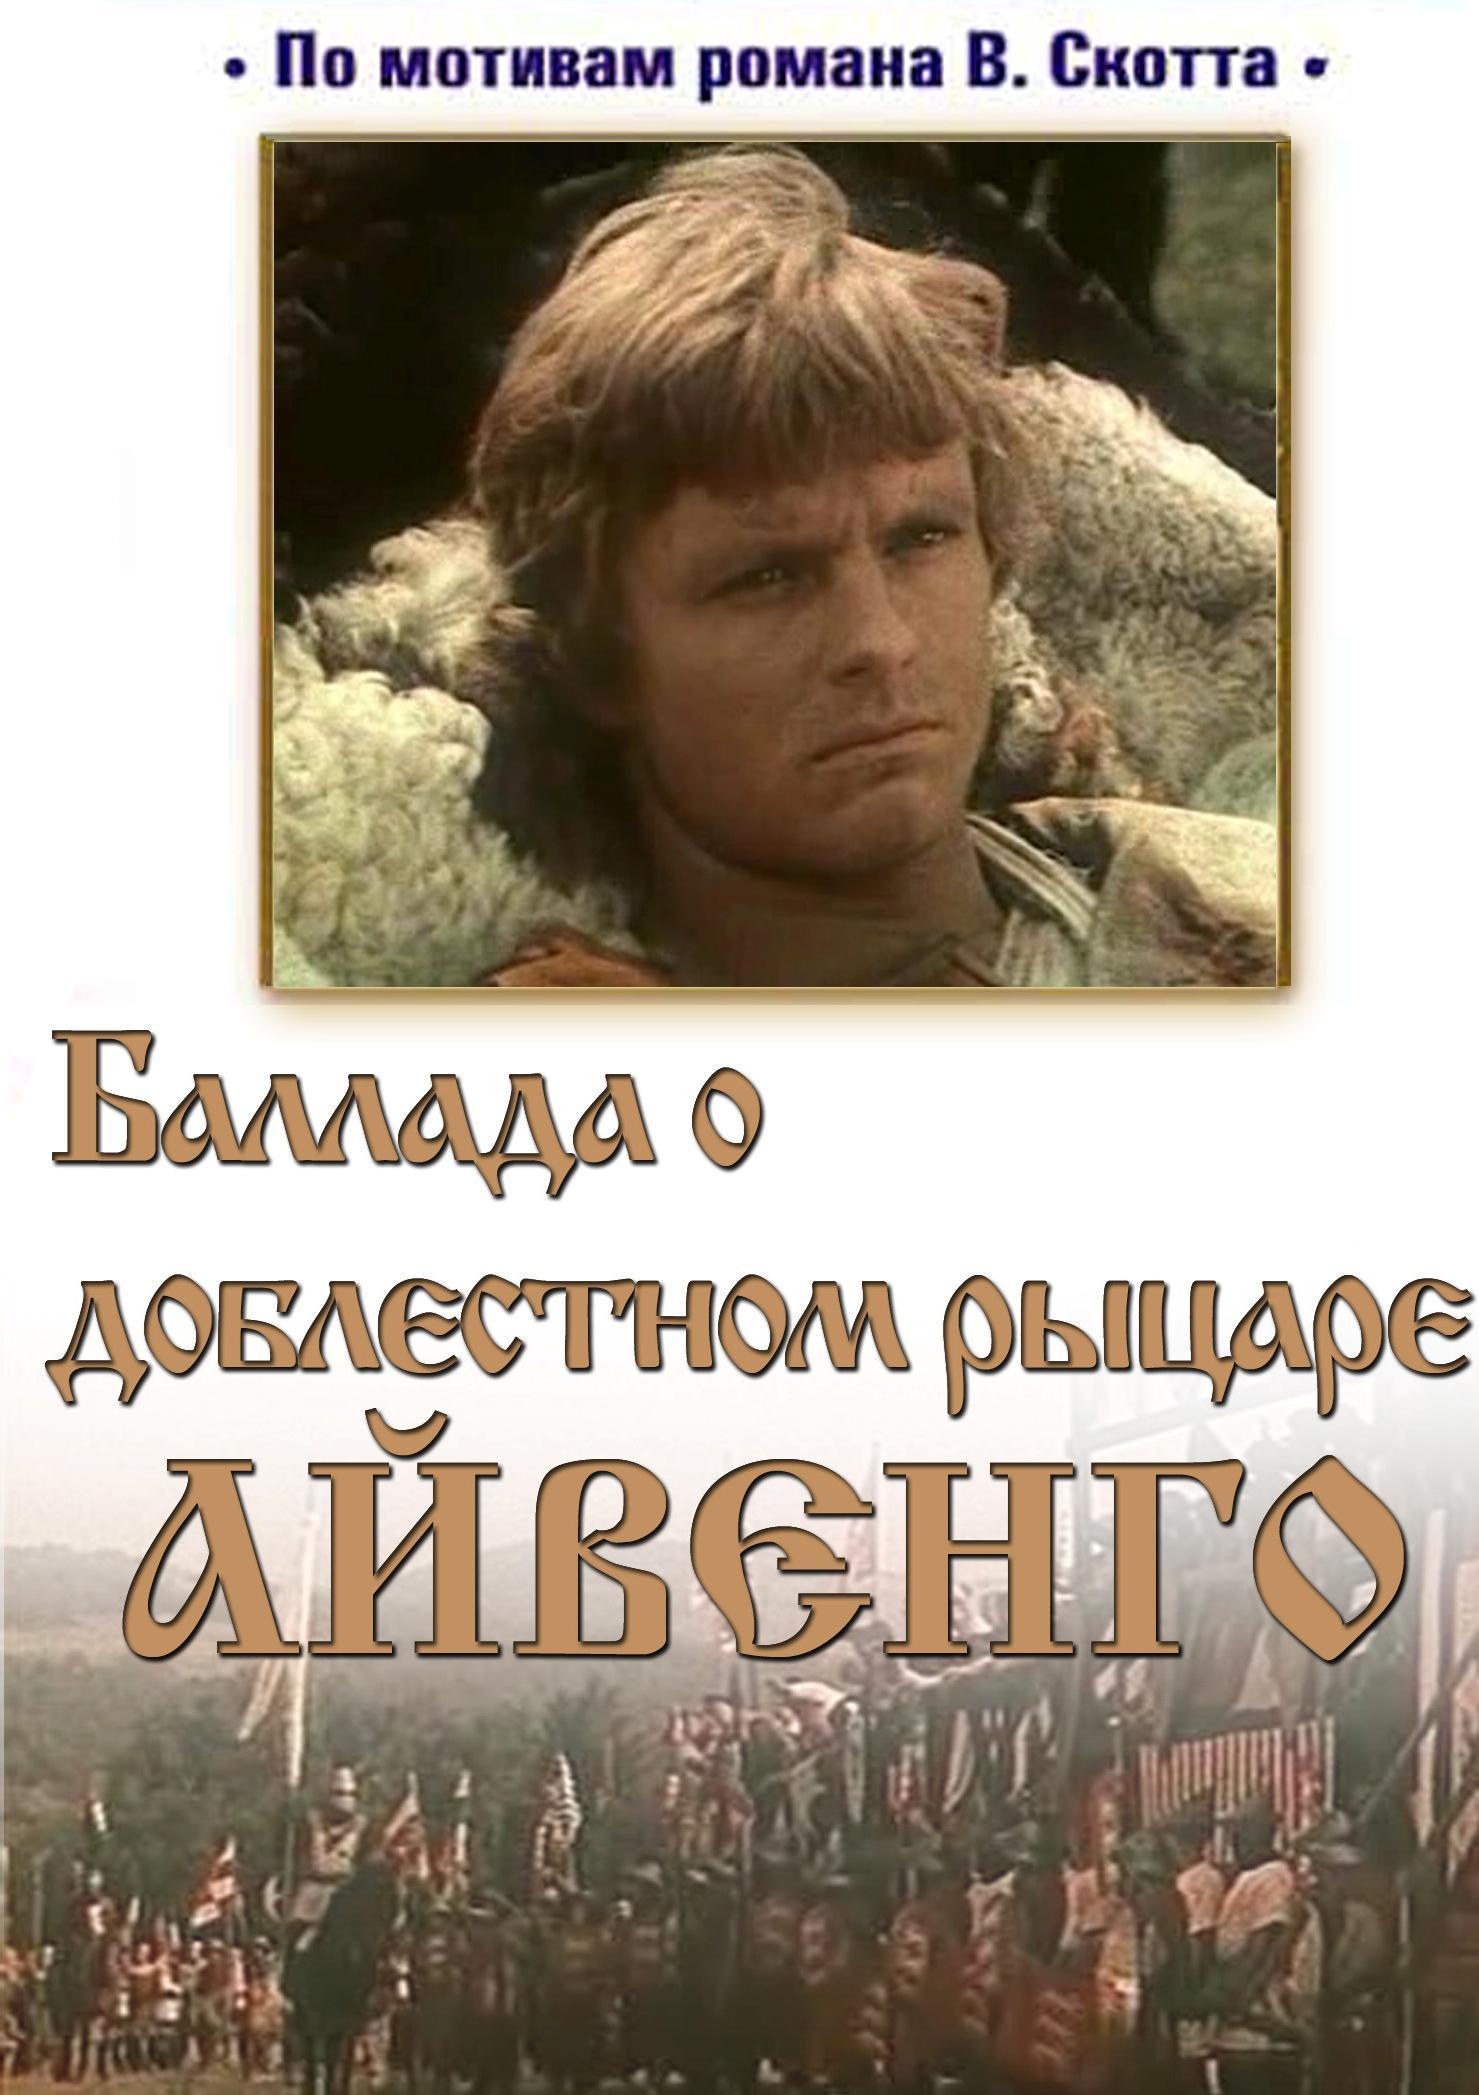 Баллада о доблестном рыцаре айвенго постер